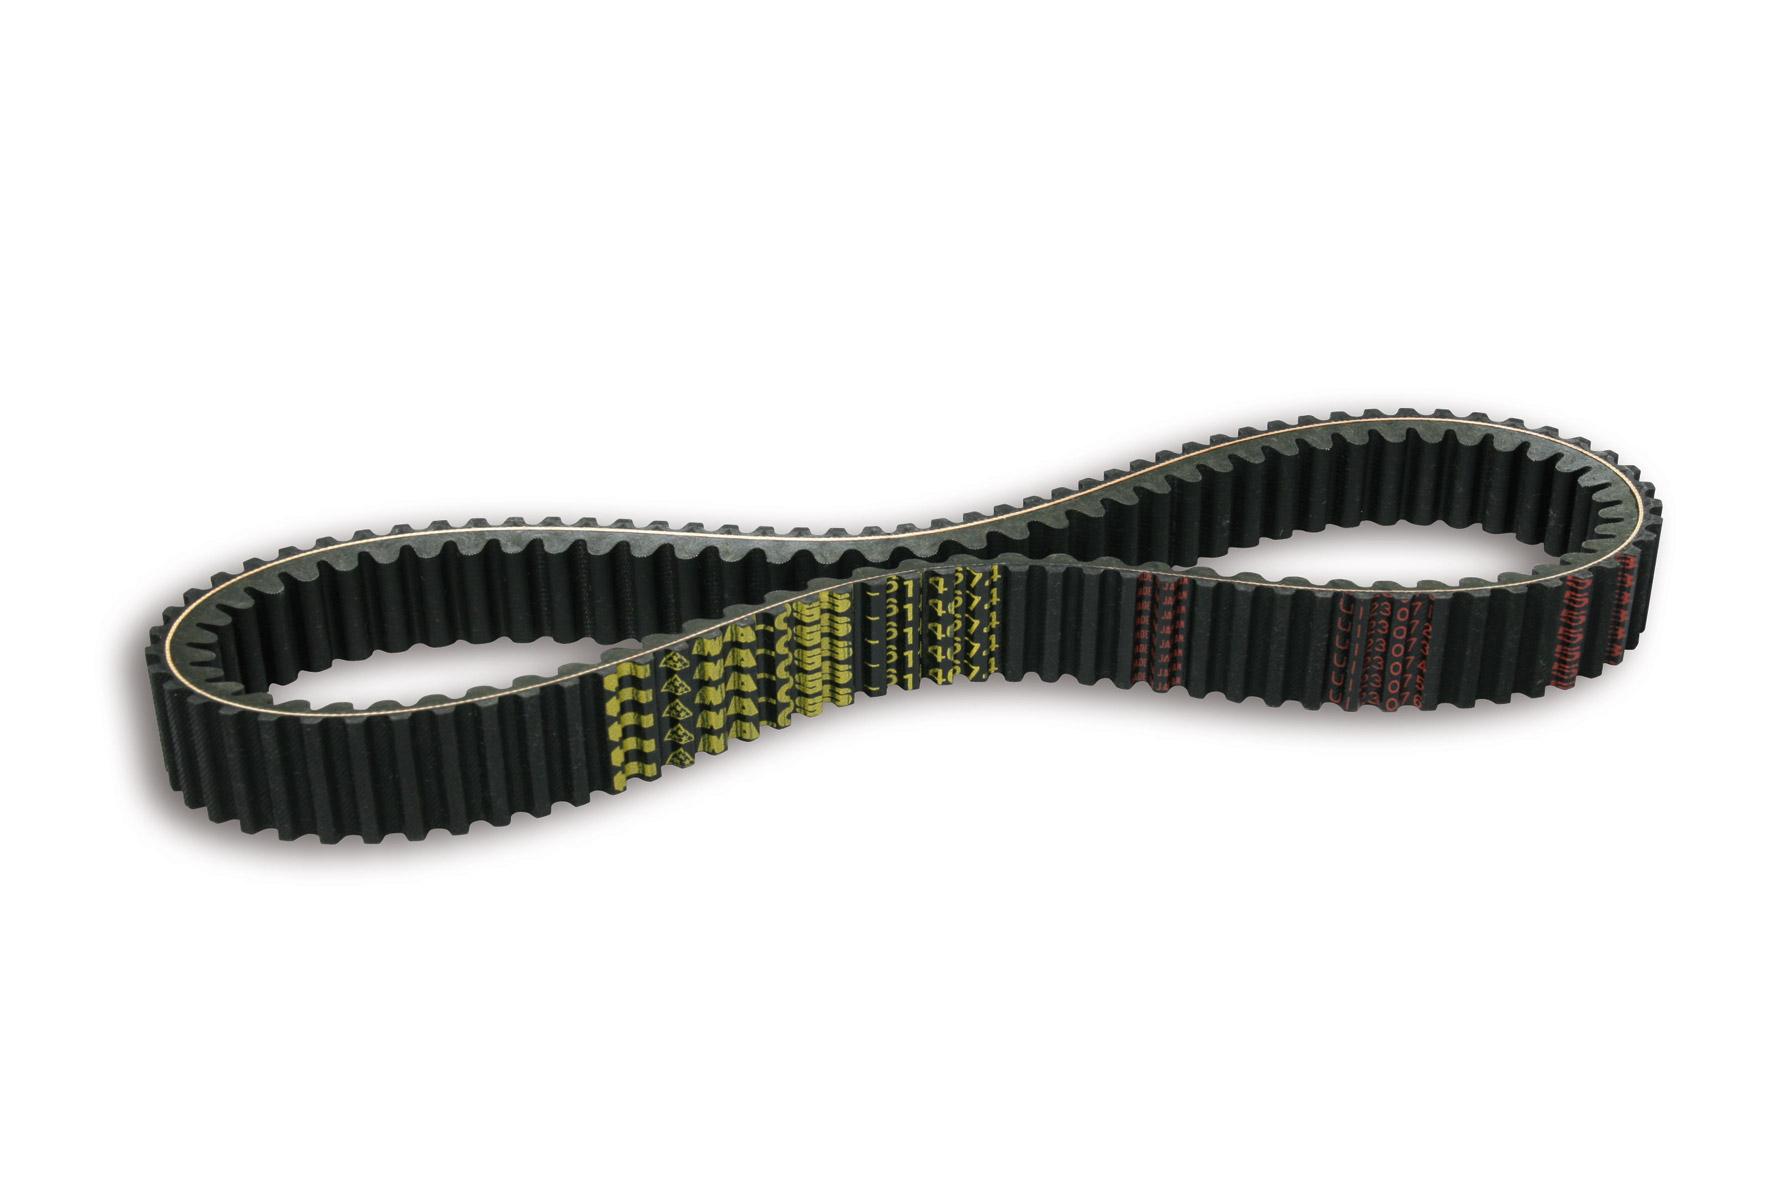 X K belt for YAMAHA T MAX 500 (32,2x14,9x892 mm 28°)